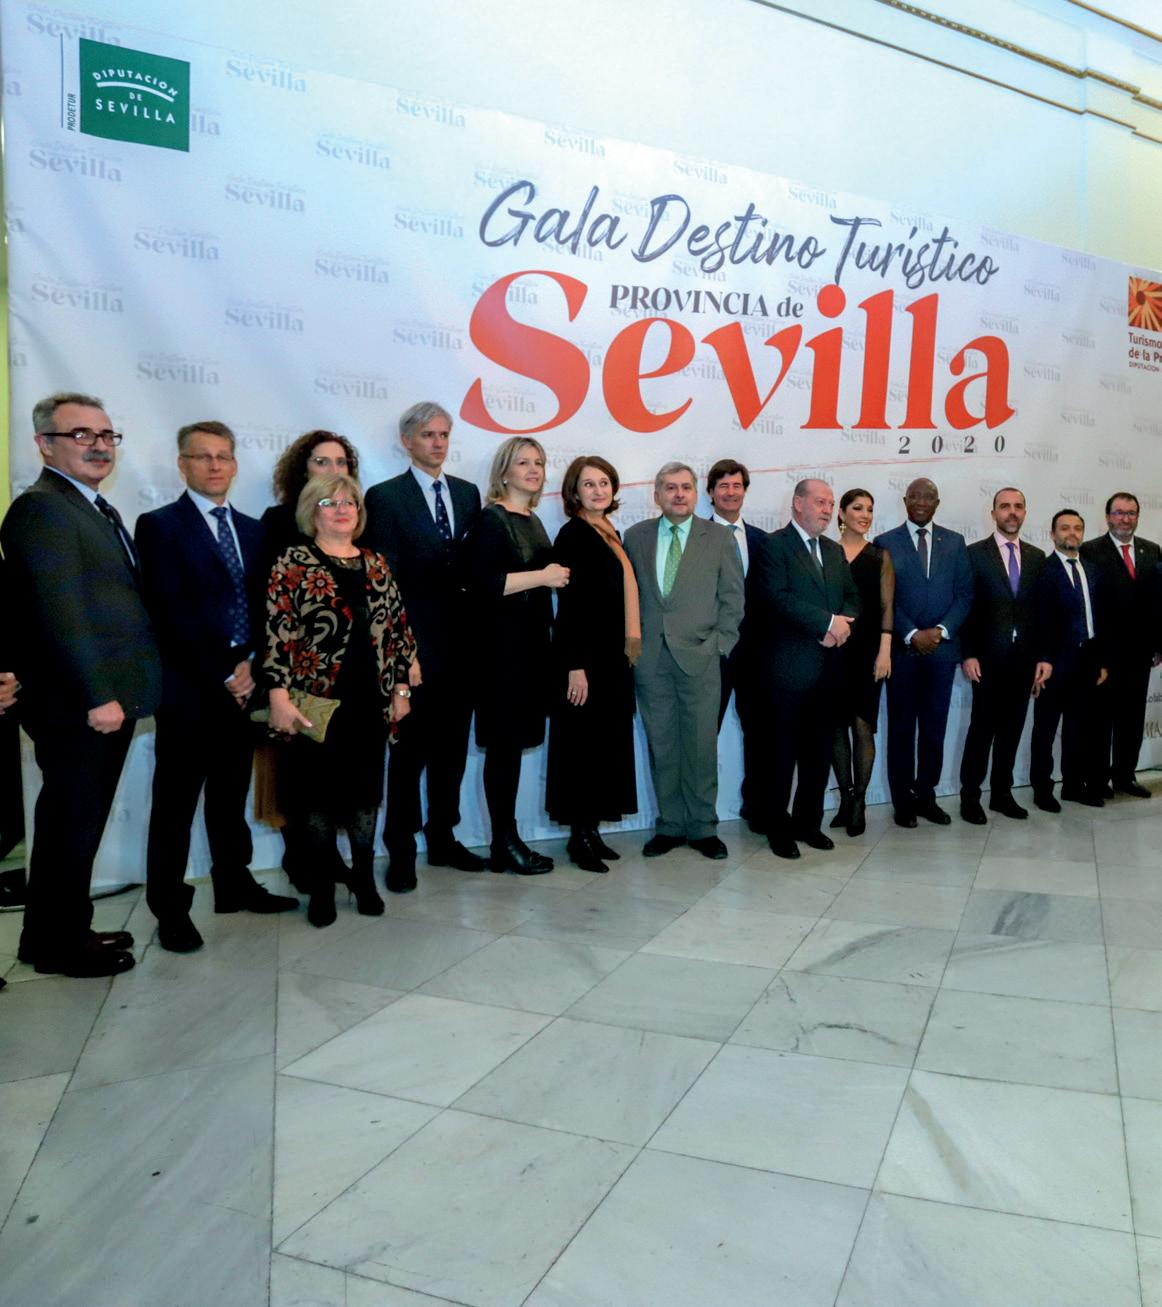 Page 58 of Provincia de Sevilla: Gala destino turístico